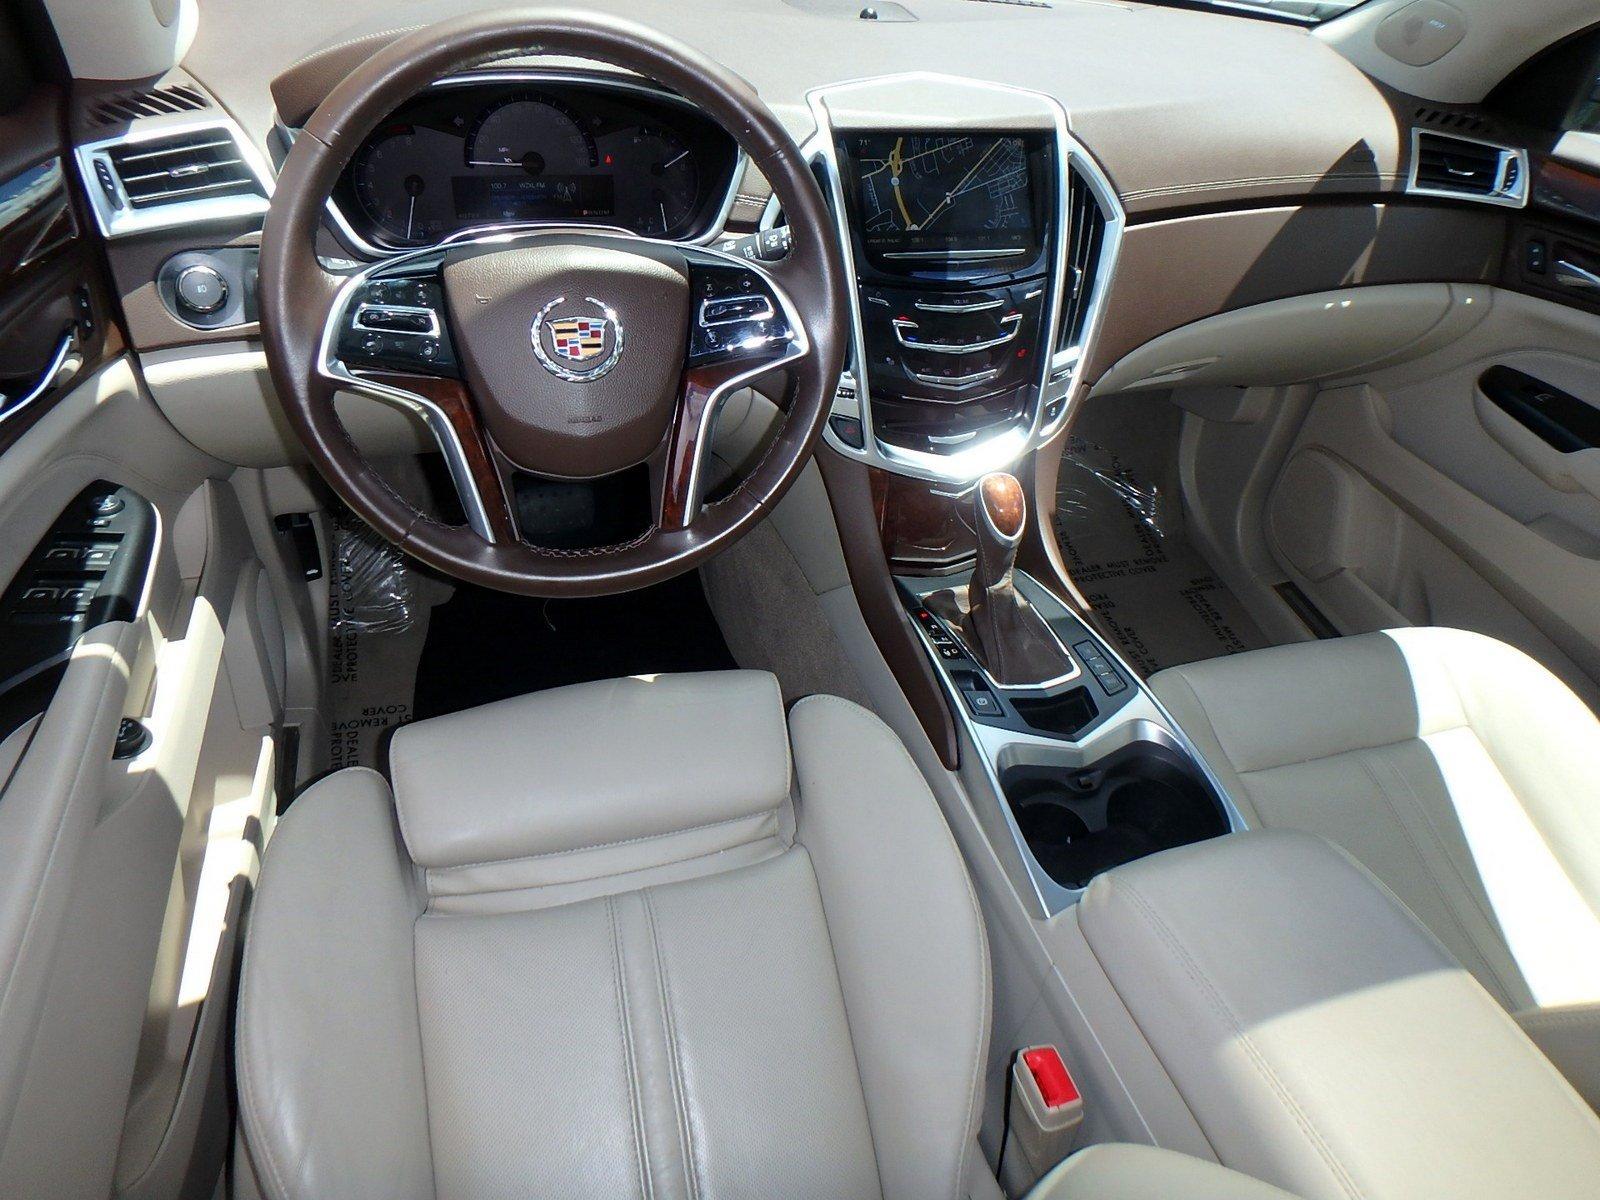 Used 2014 CADILLAC SRX For Sale at Action Hyundai   VIN